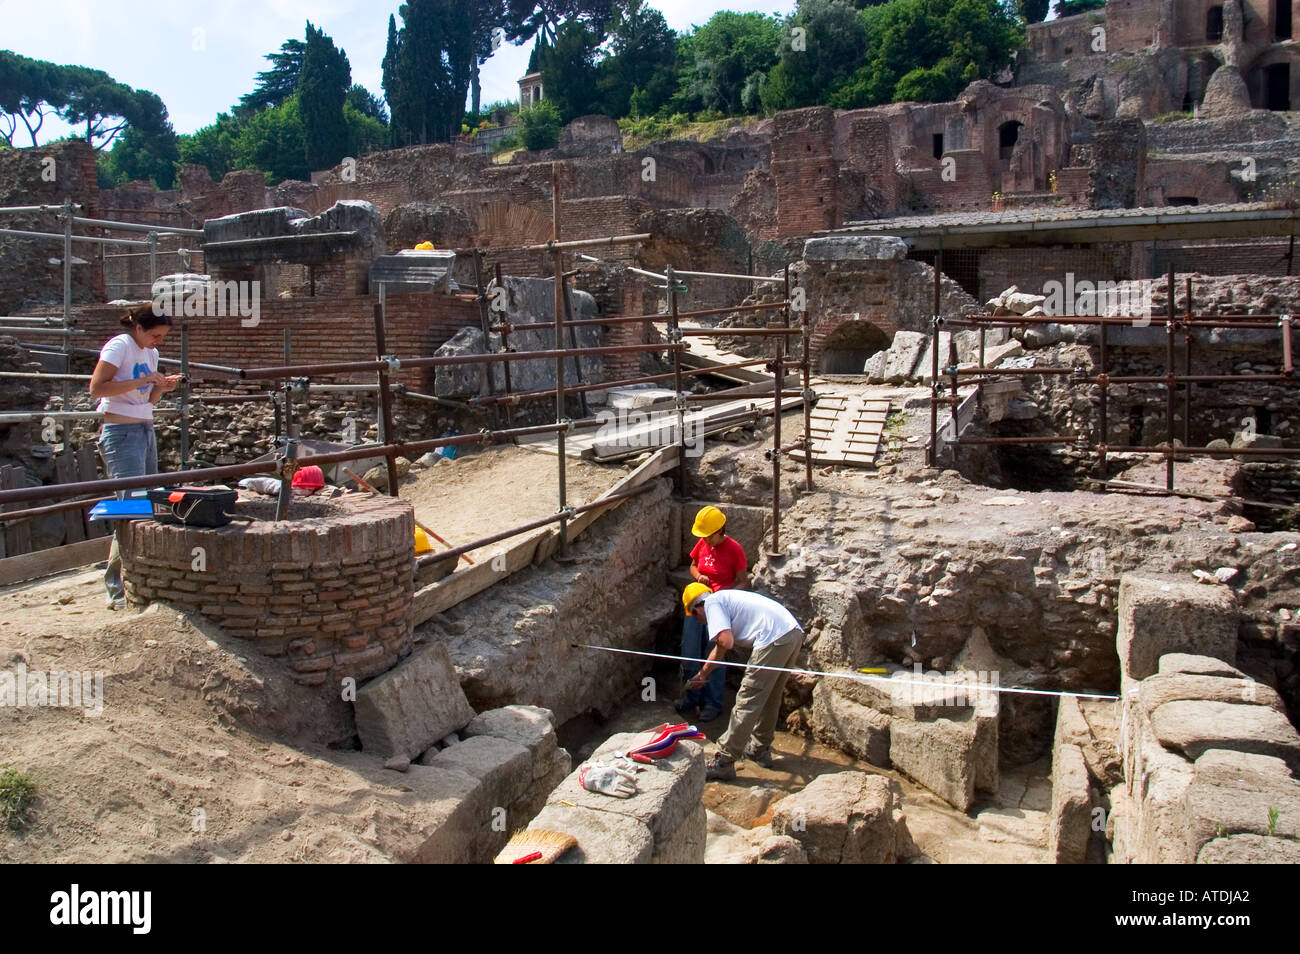 Archaeolic excavation Roman ruins Rome Italy Stock Photo